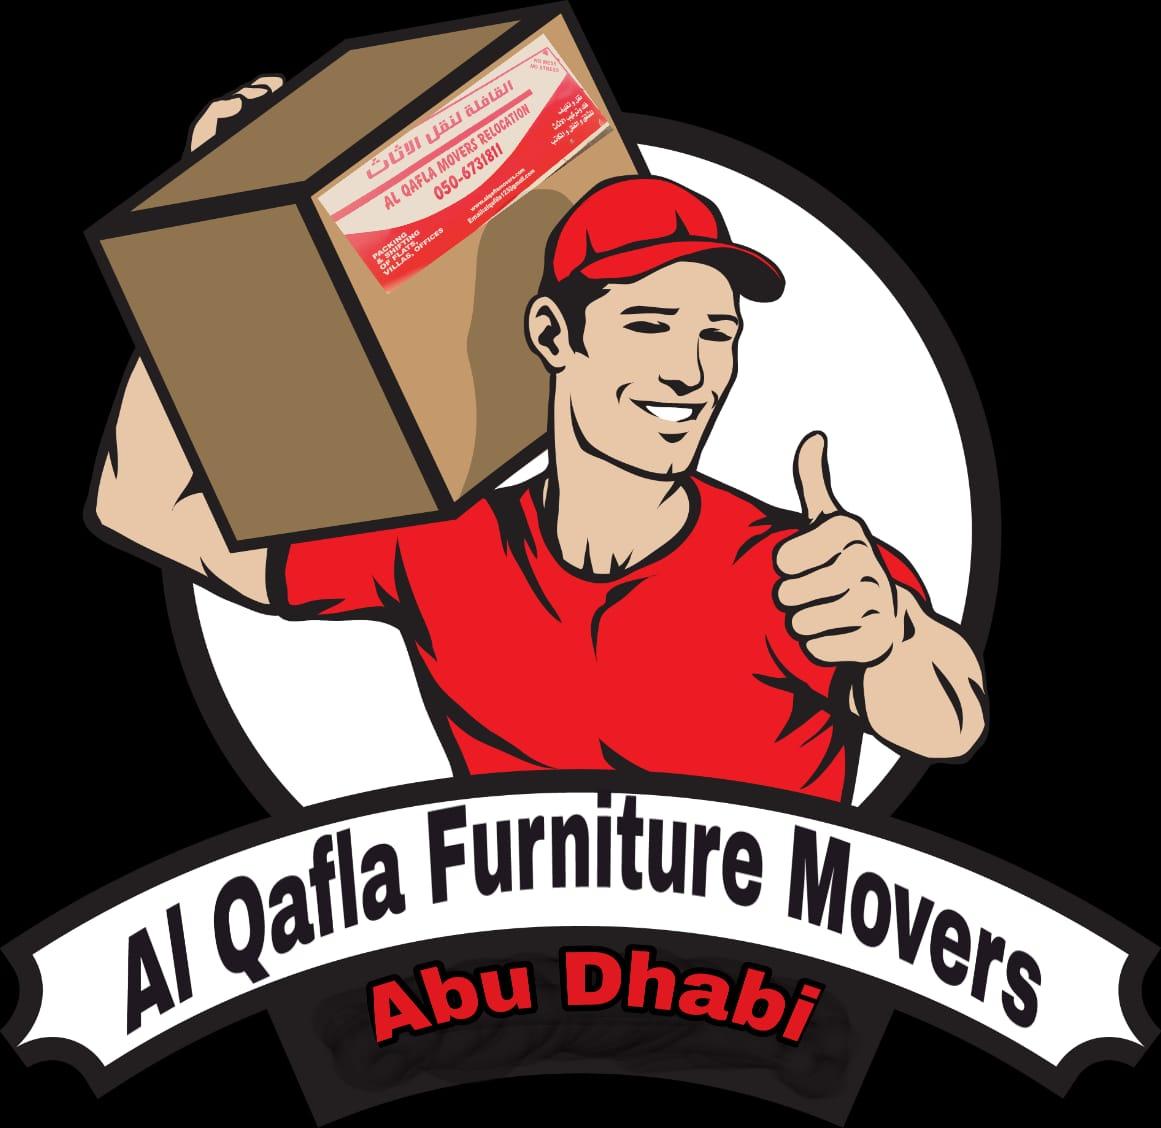 Al Qafla Furniture Movers